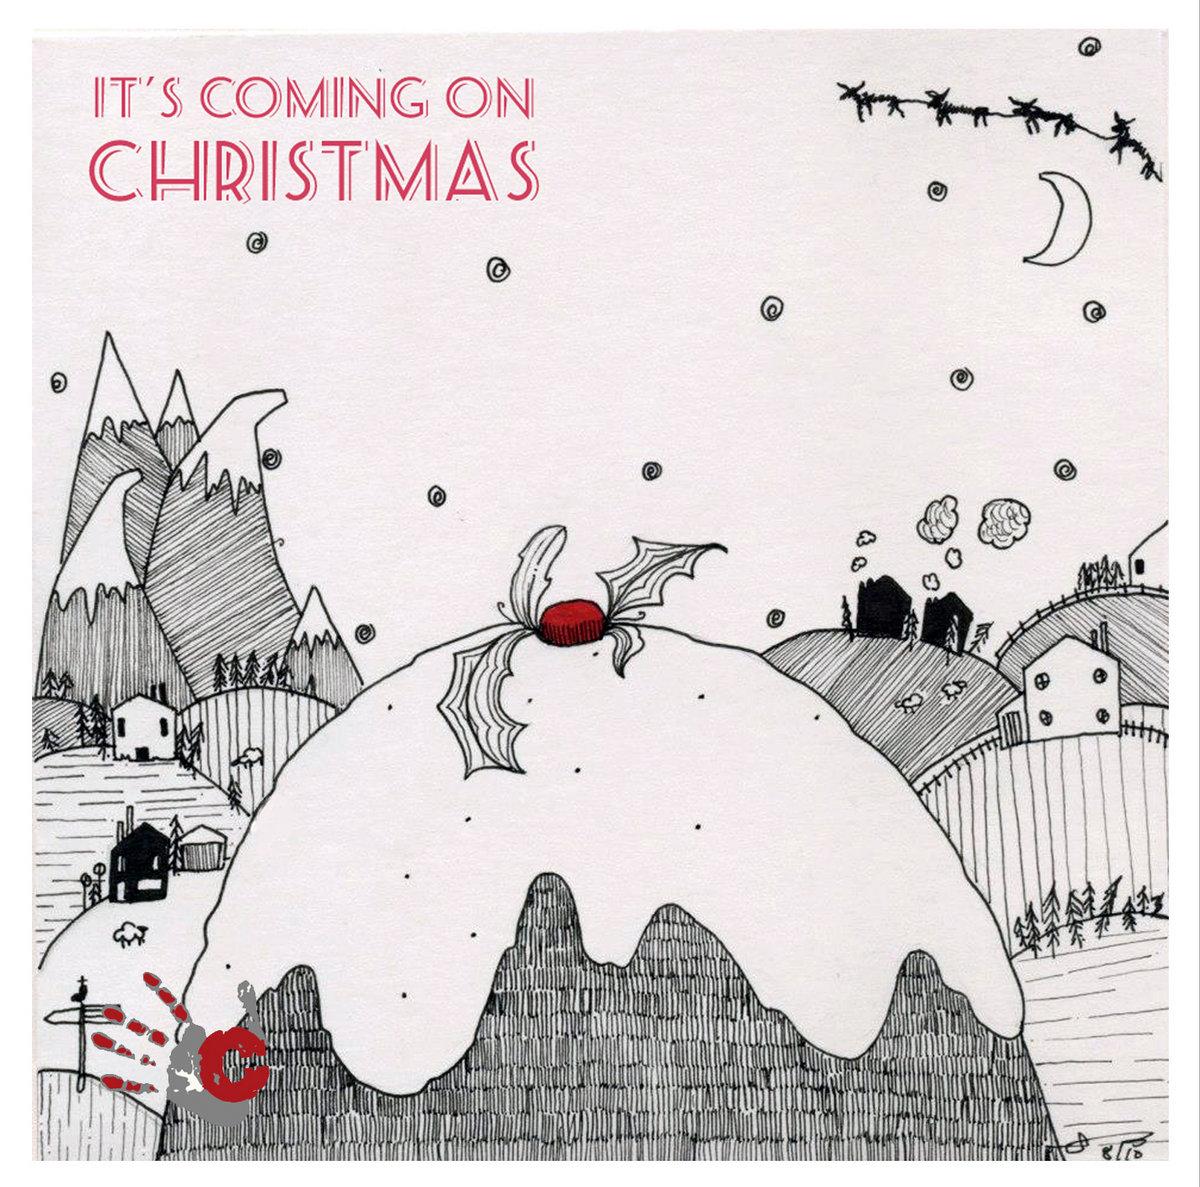 Just Like Christmas | DaisyDigital